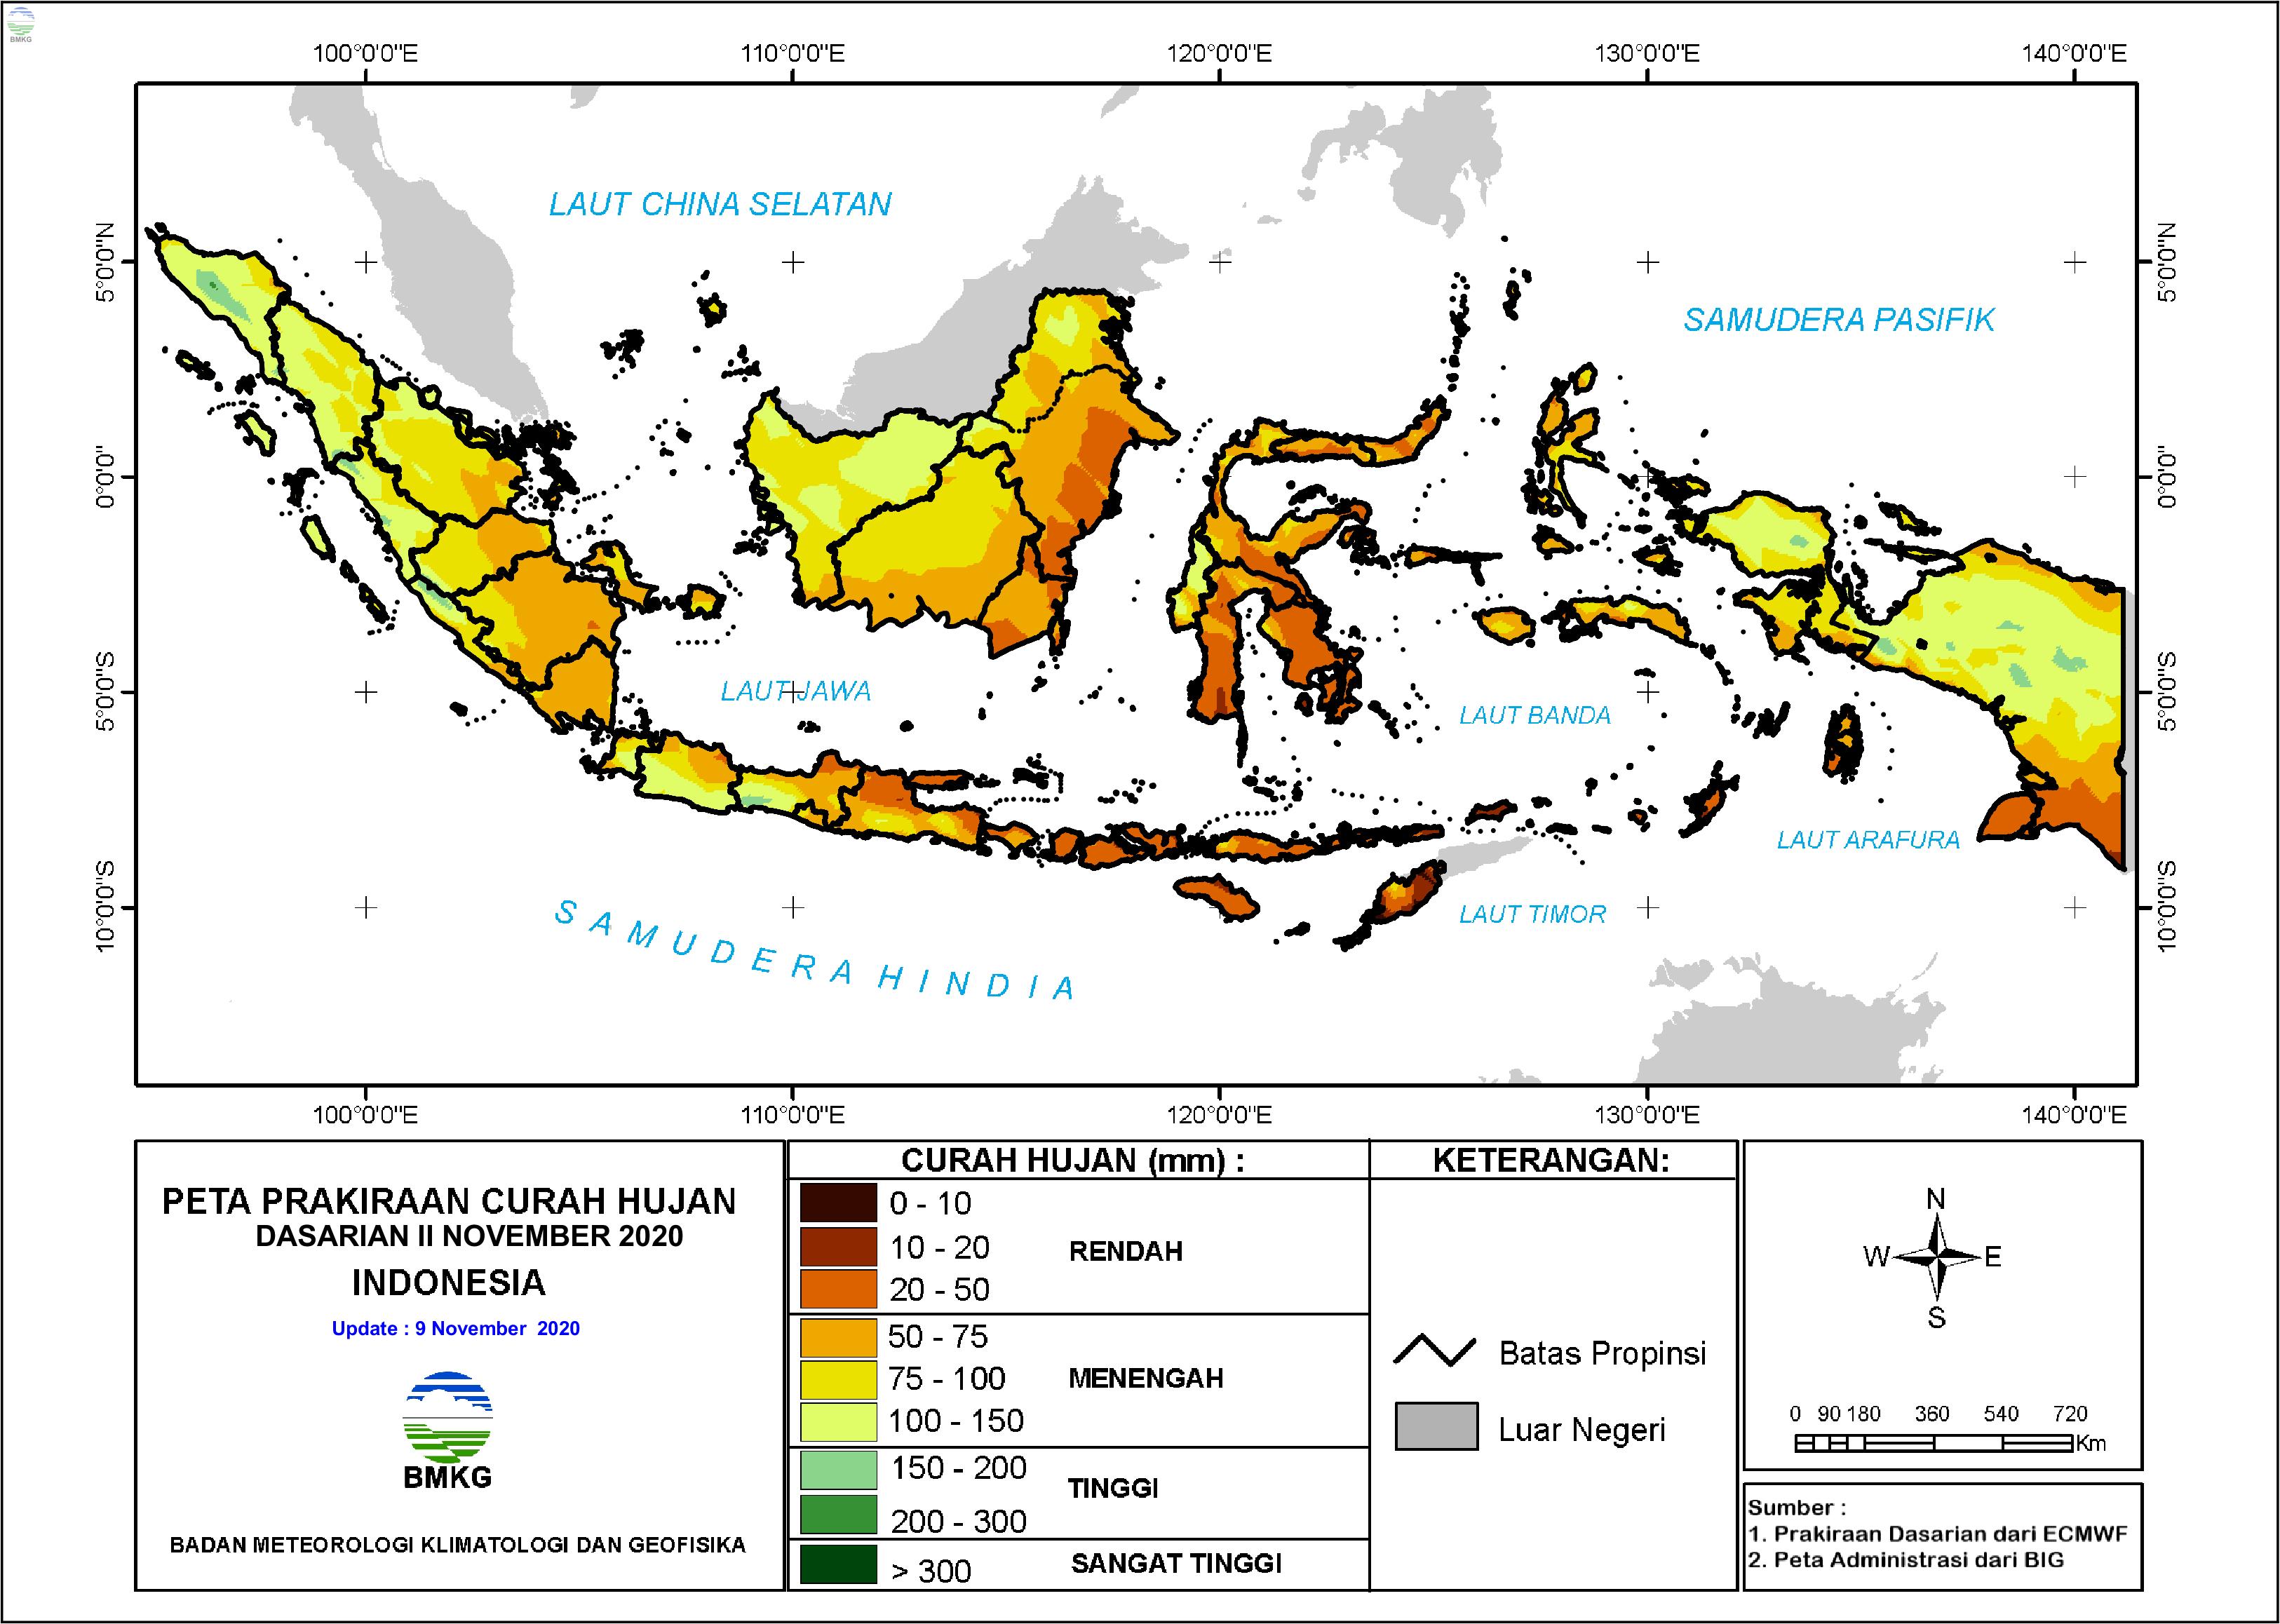 Prakiraan Hujan Dasarian II - III November dan I Desember 2020